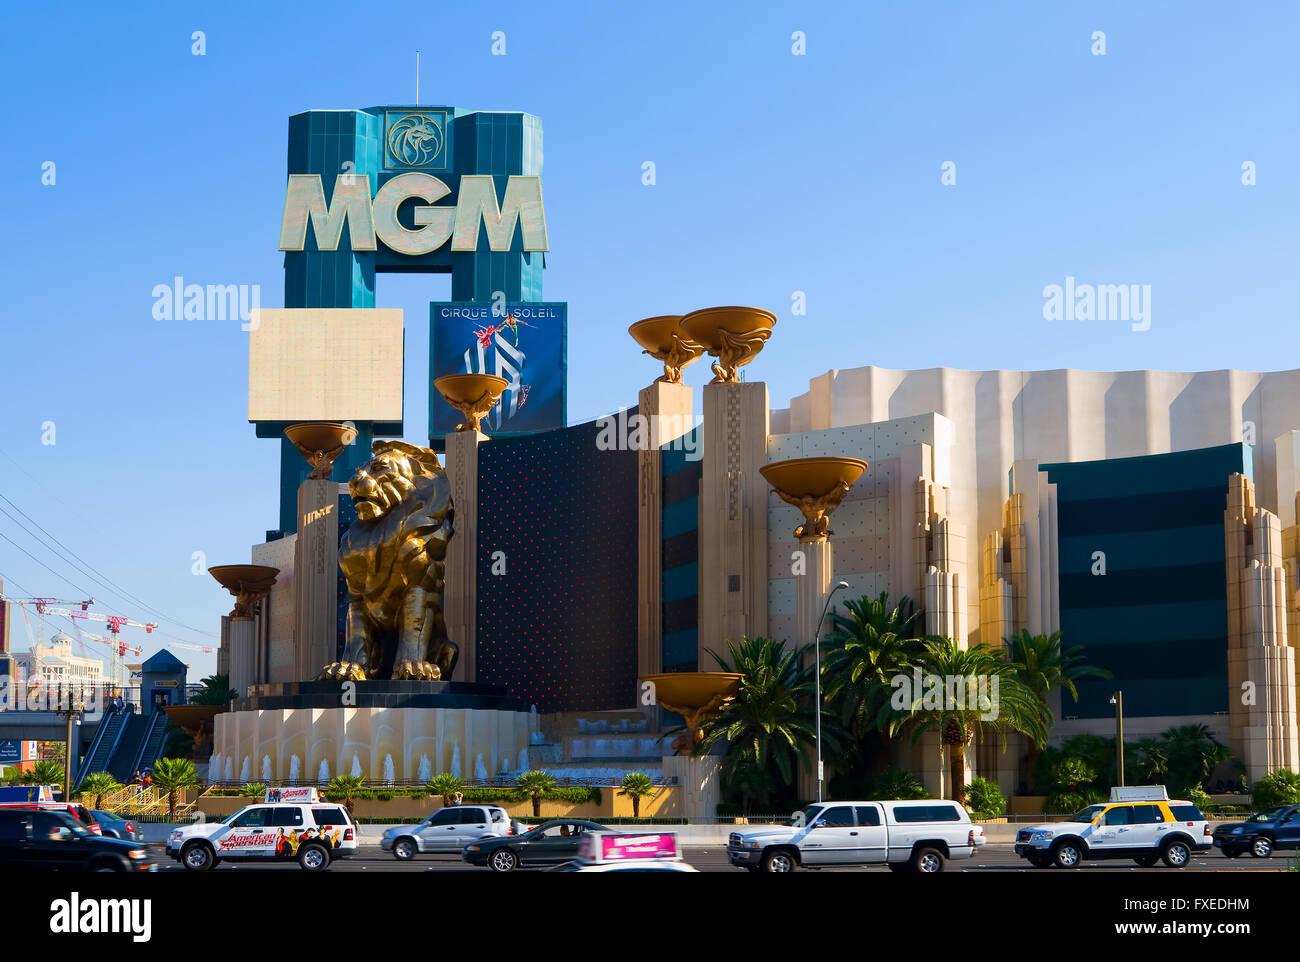 MGM Casino in Las Vegas - Stock Image